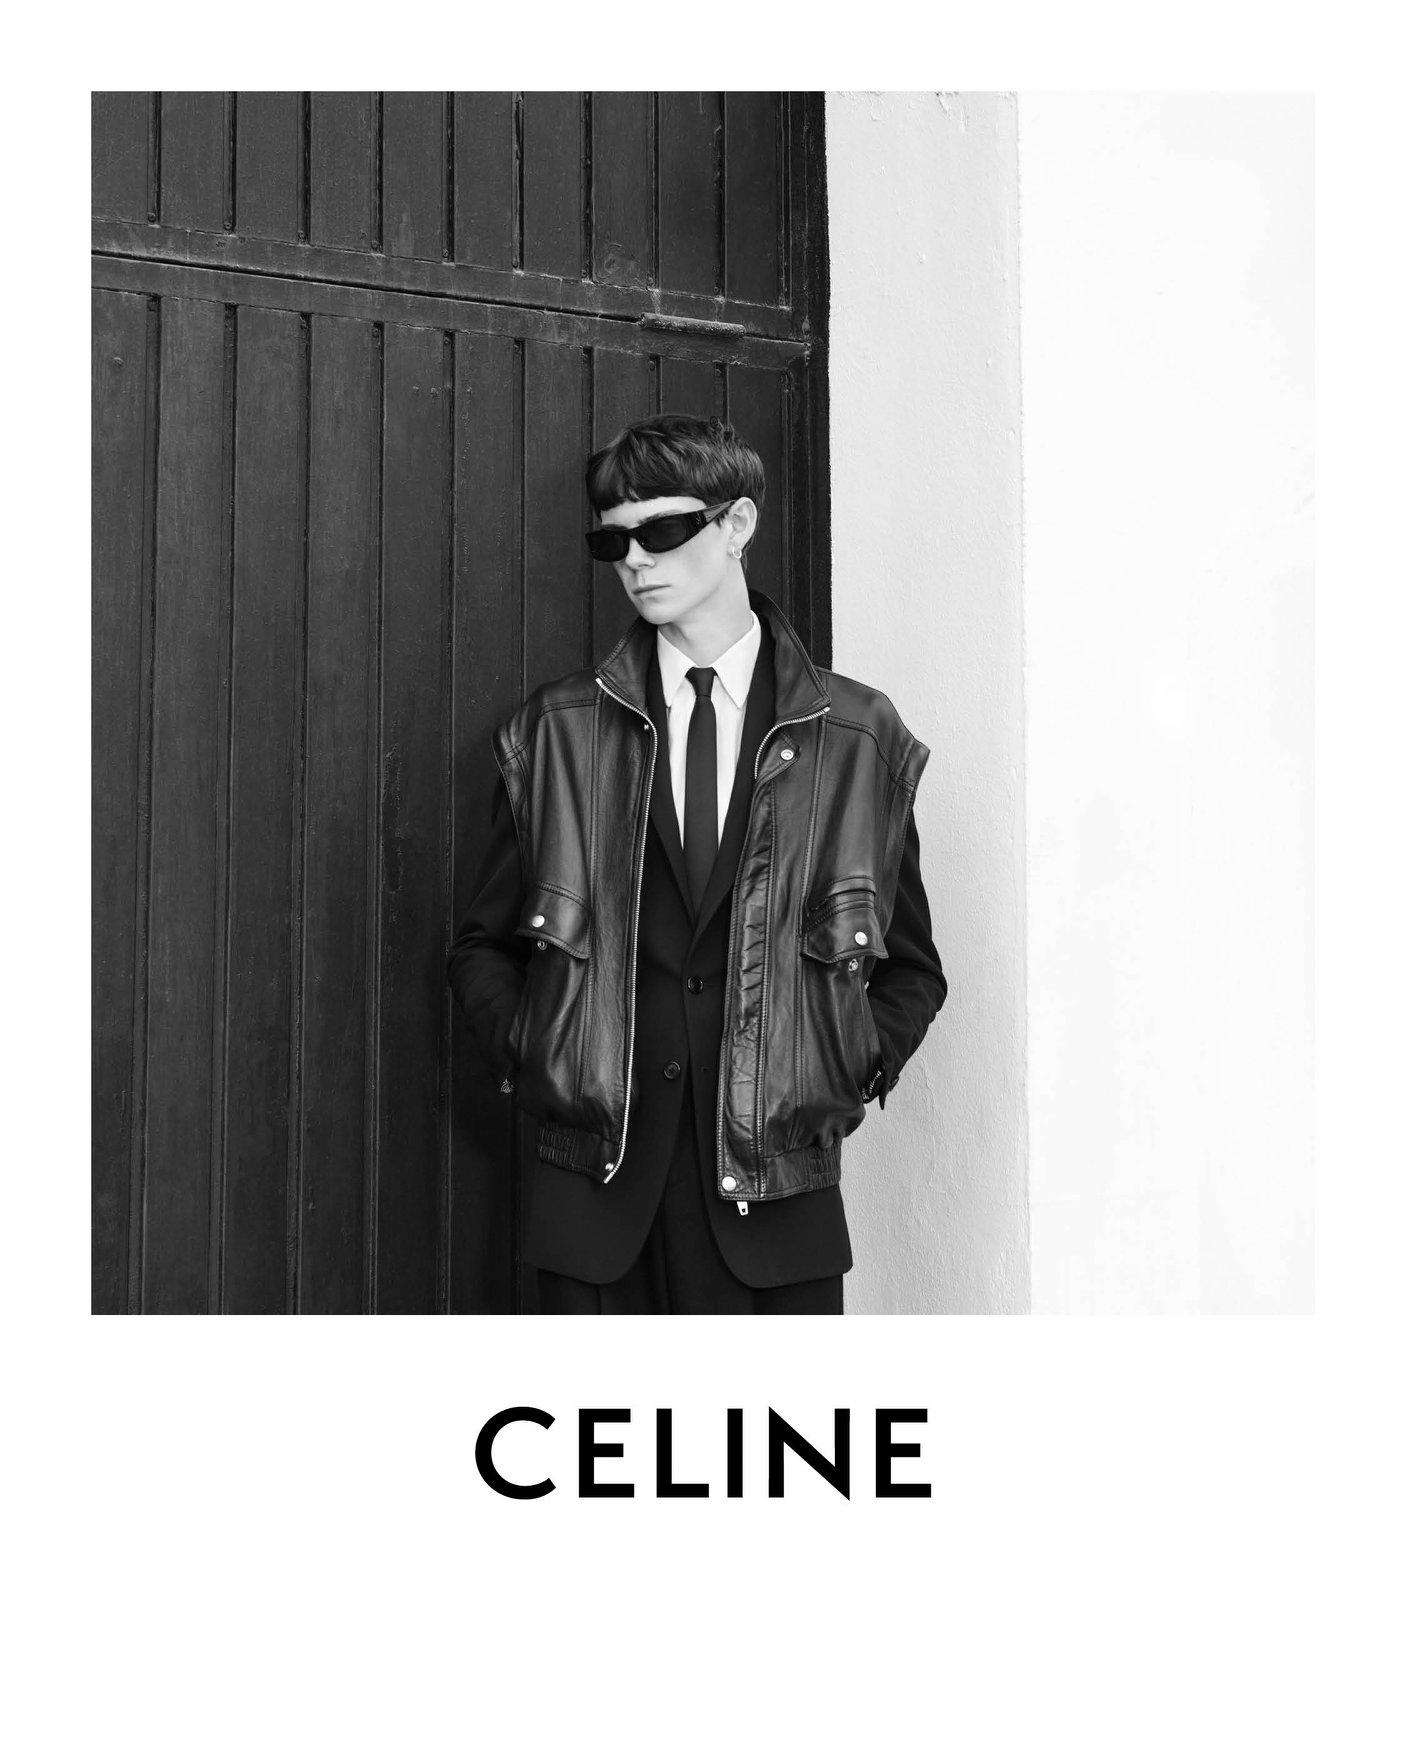 Celine Homme Spring 2021 Ad Campaign Photos